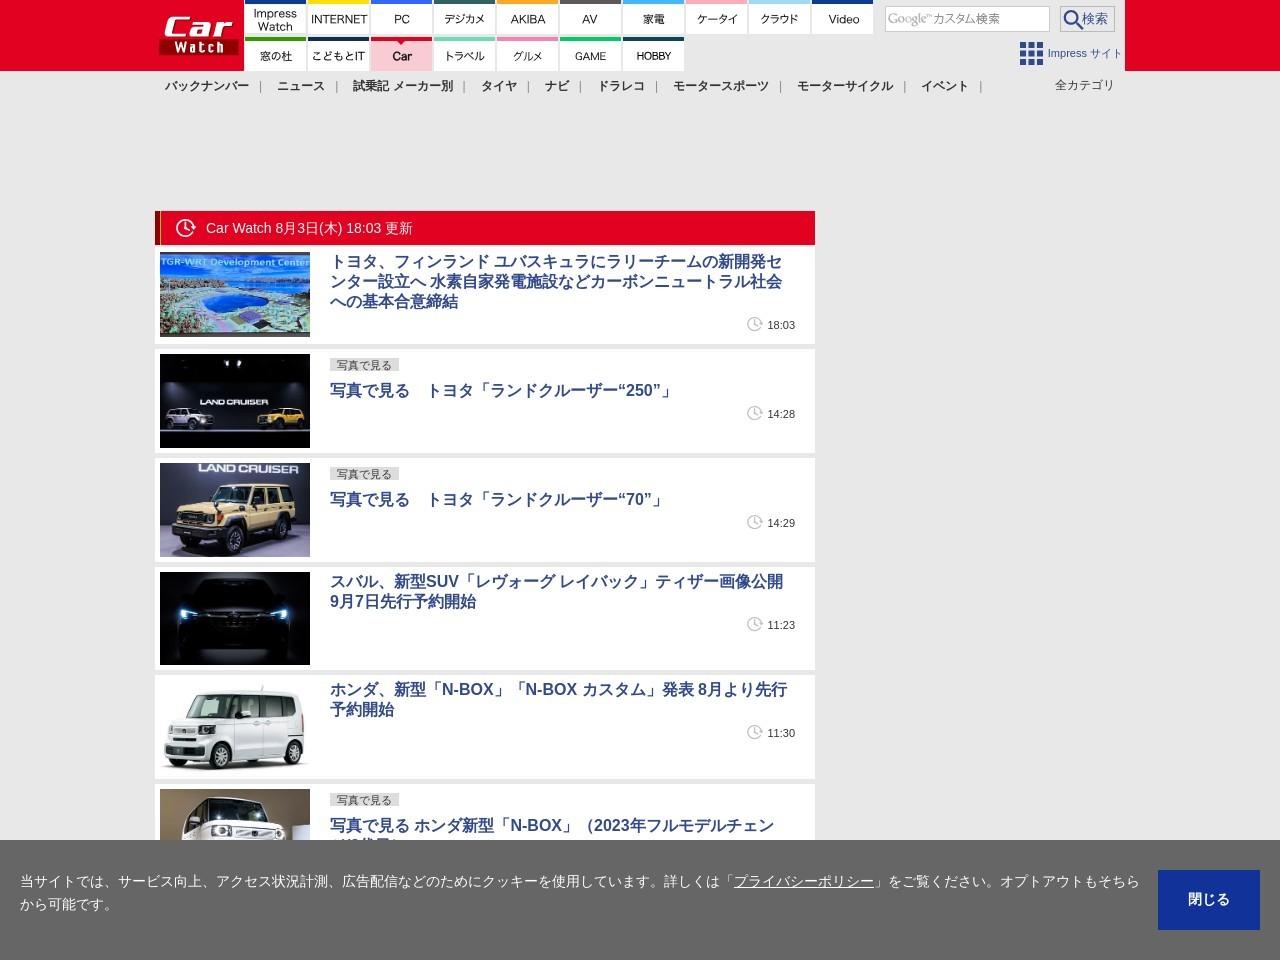 https://car.watch.impress.co.jp/docs/news/1269578.htmlのプレビュー画像